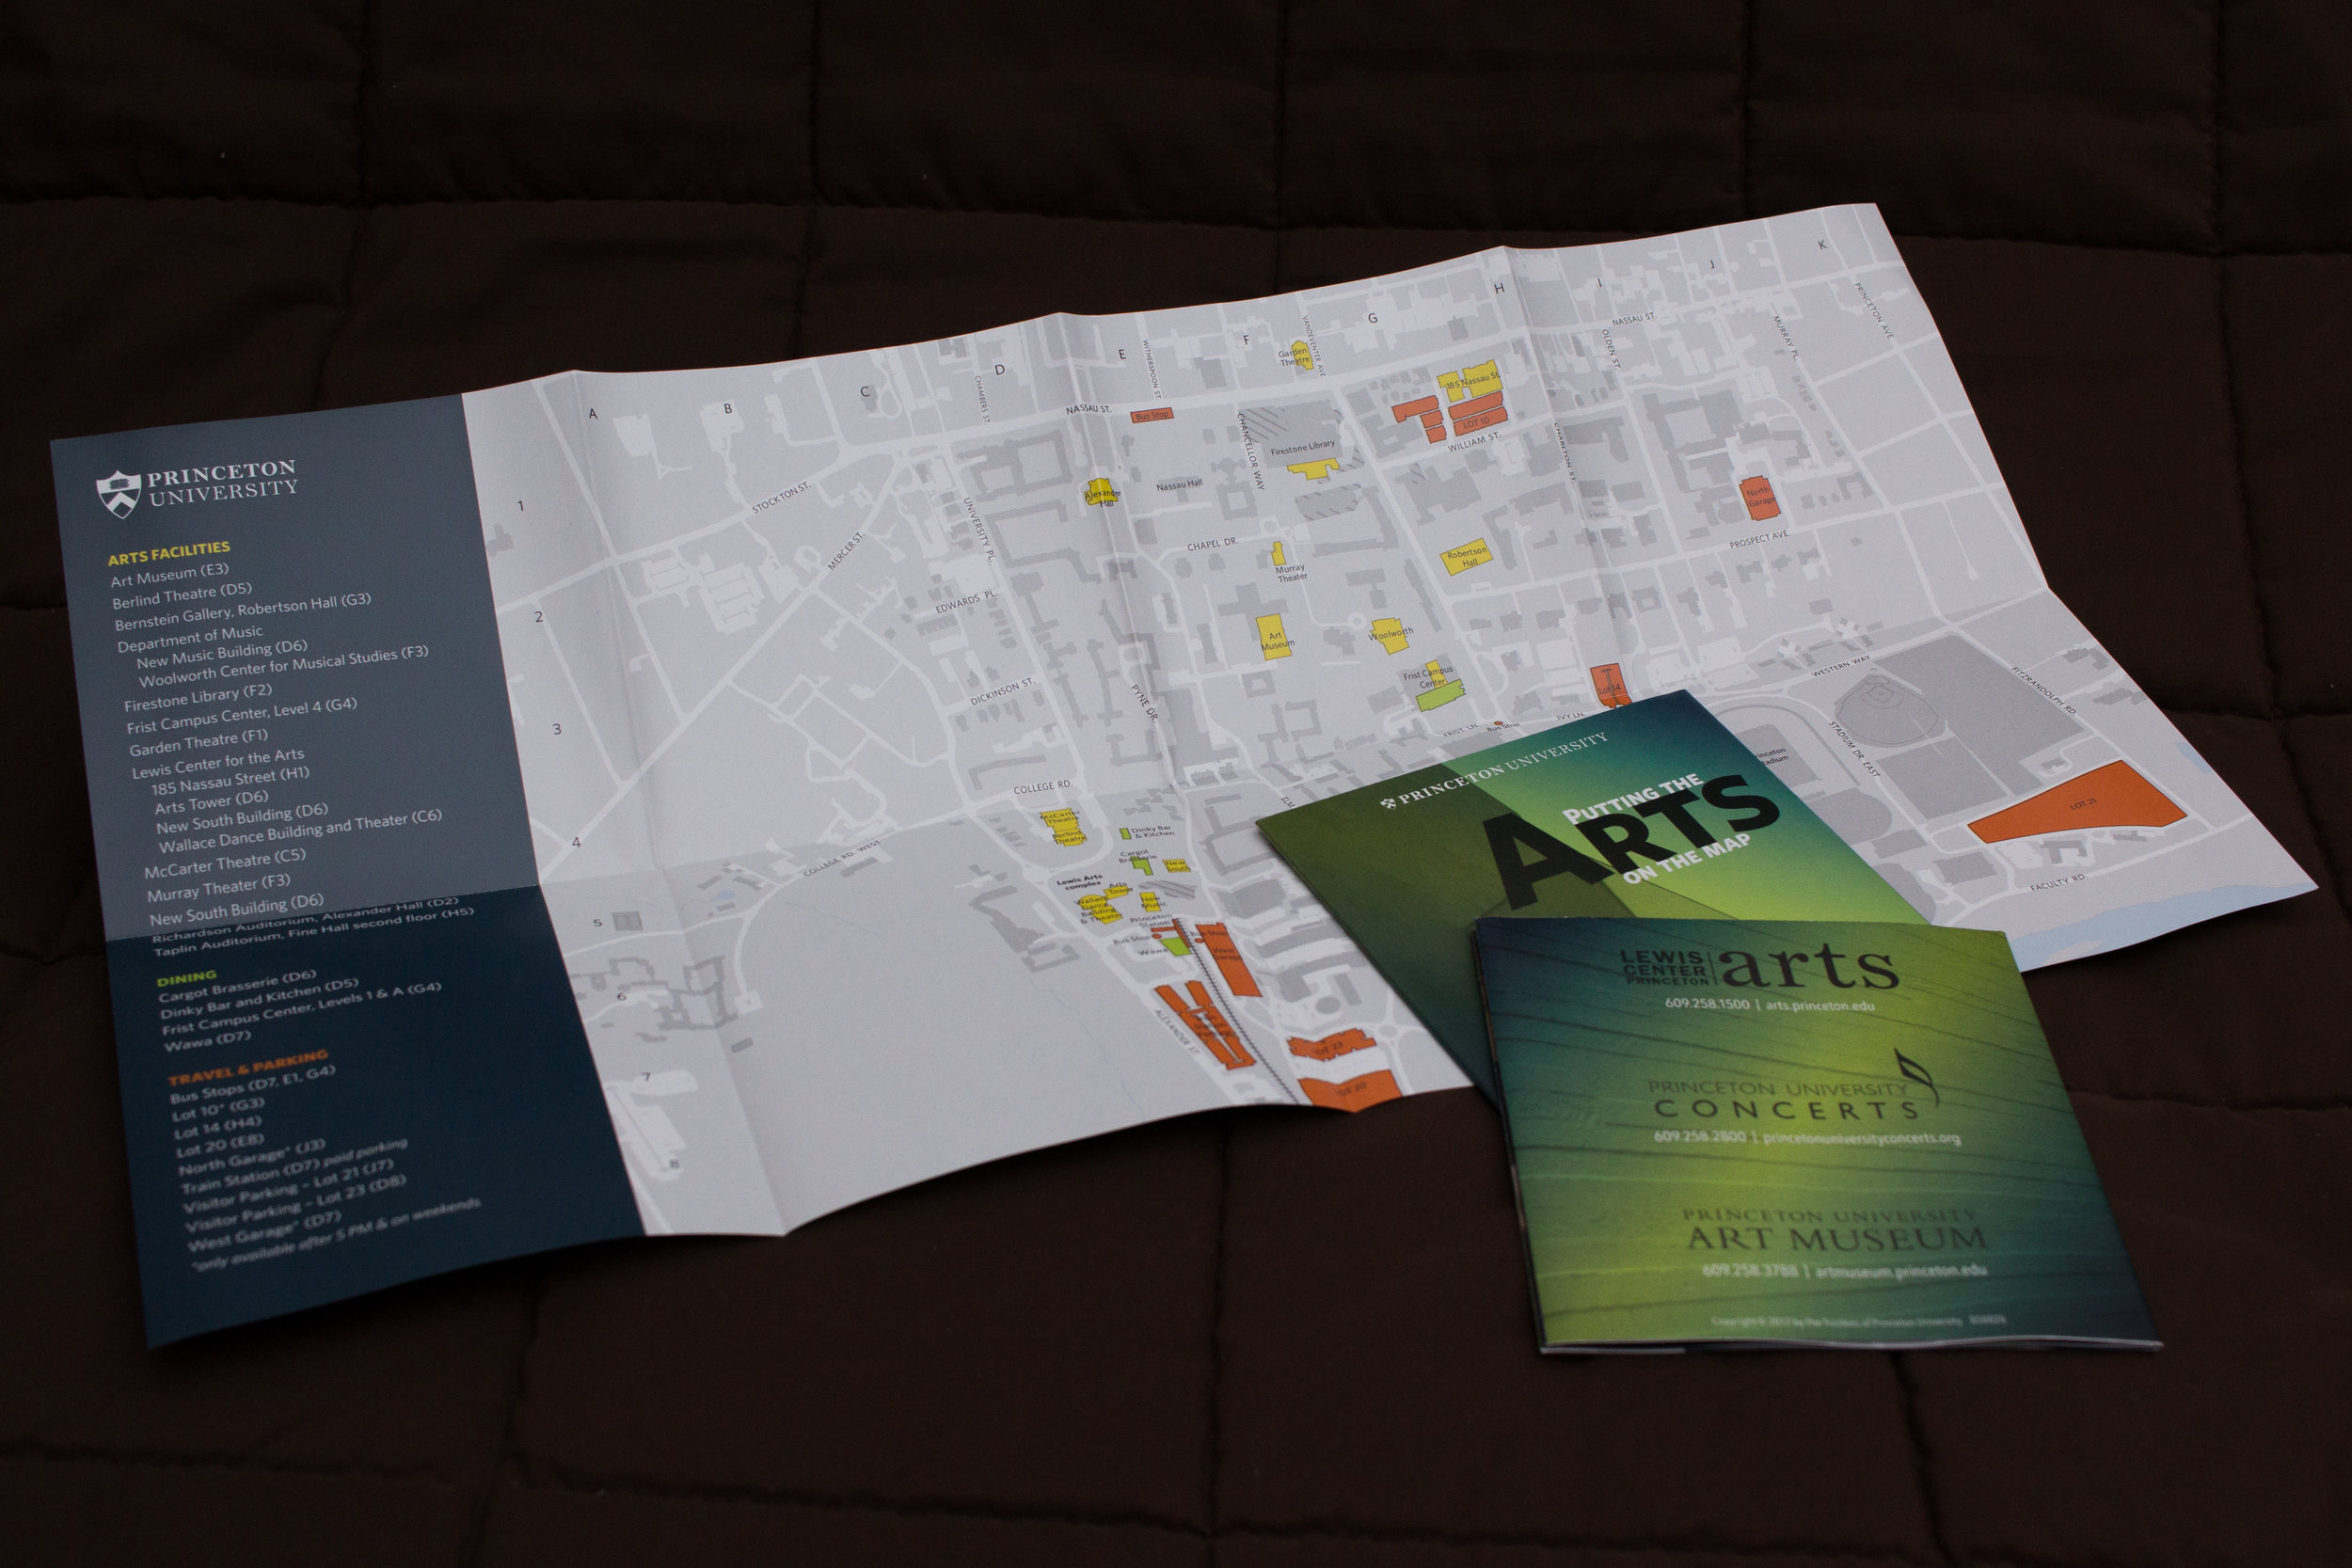 arts-map-3.jpg